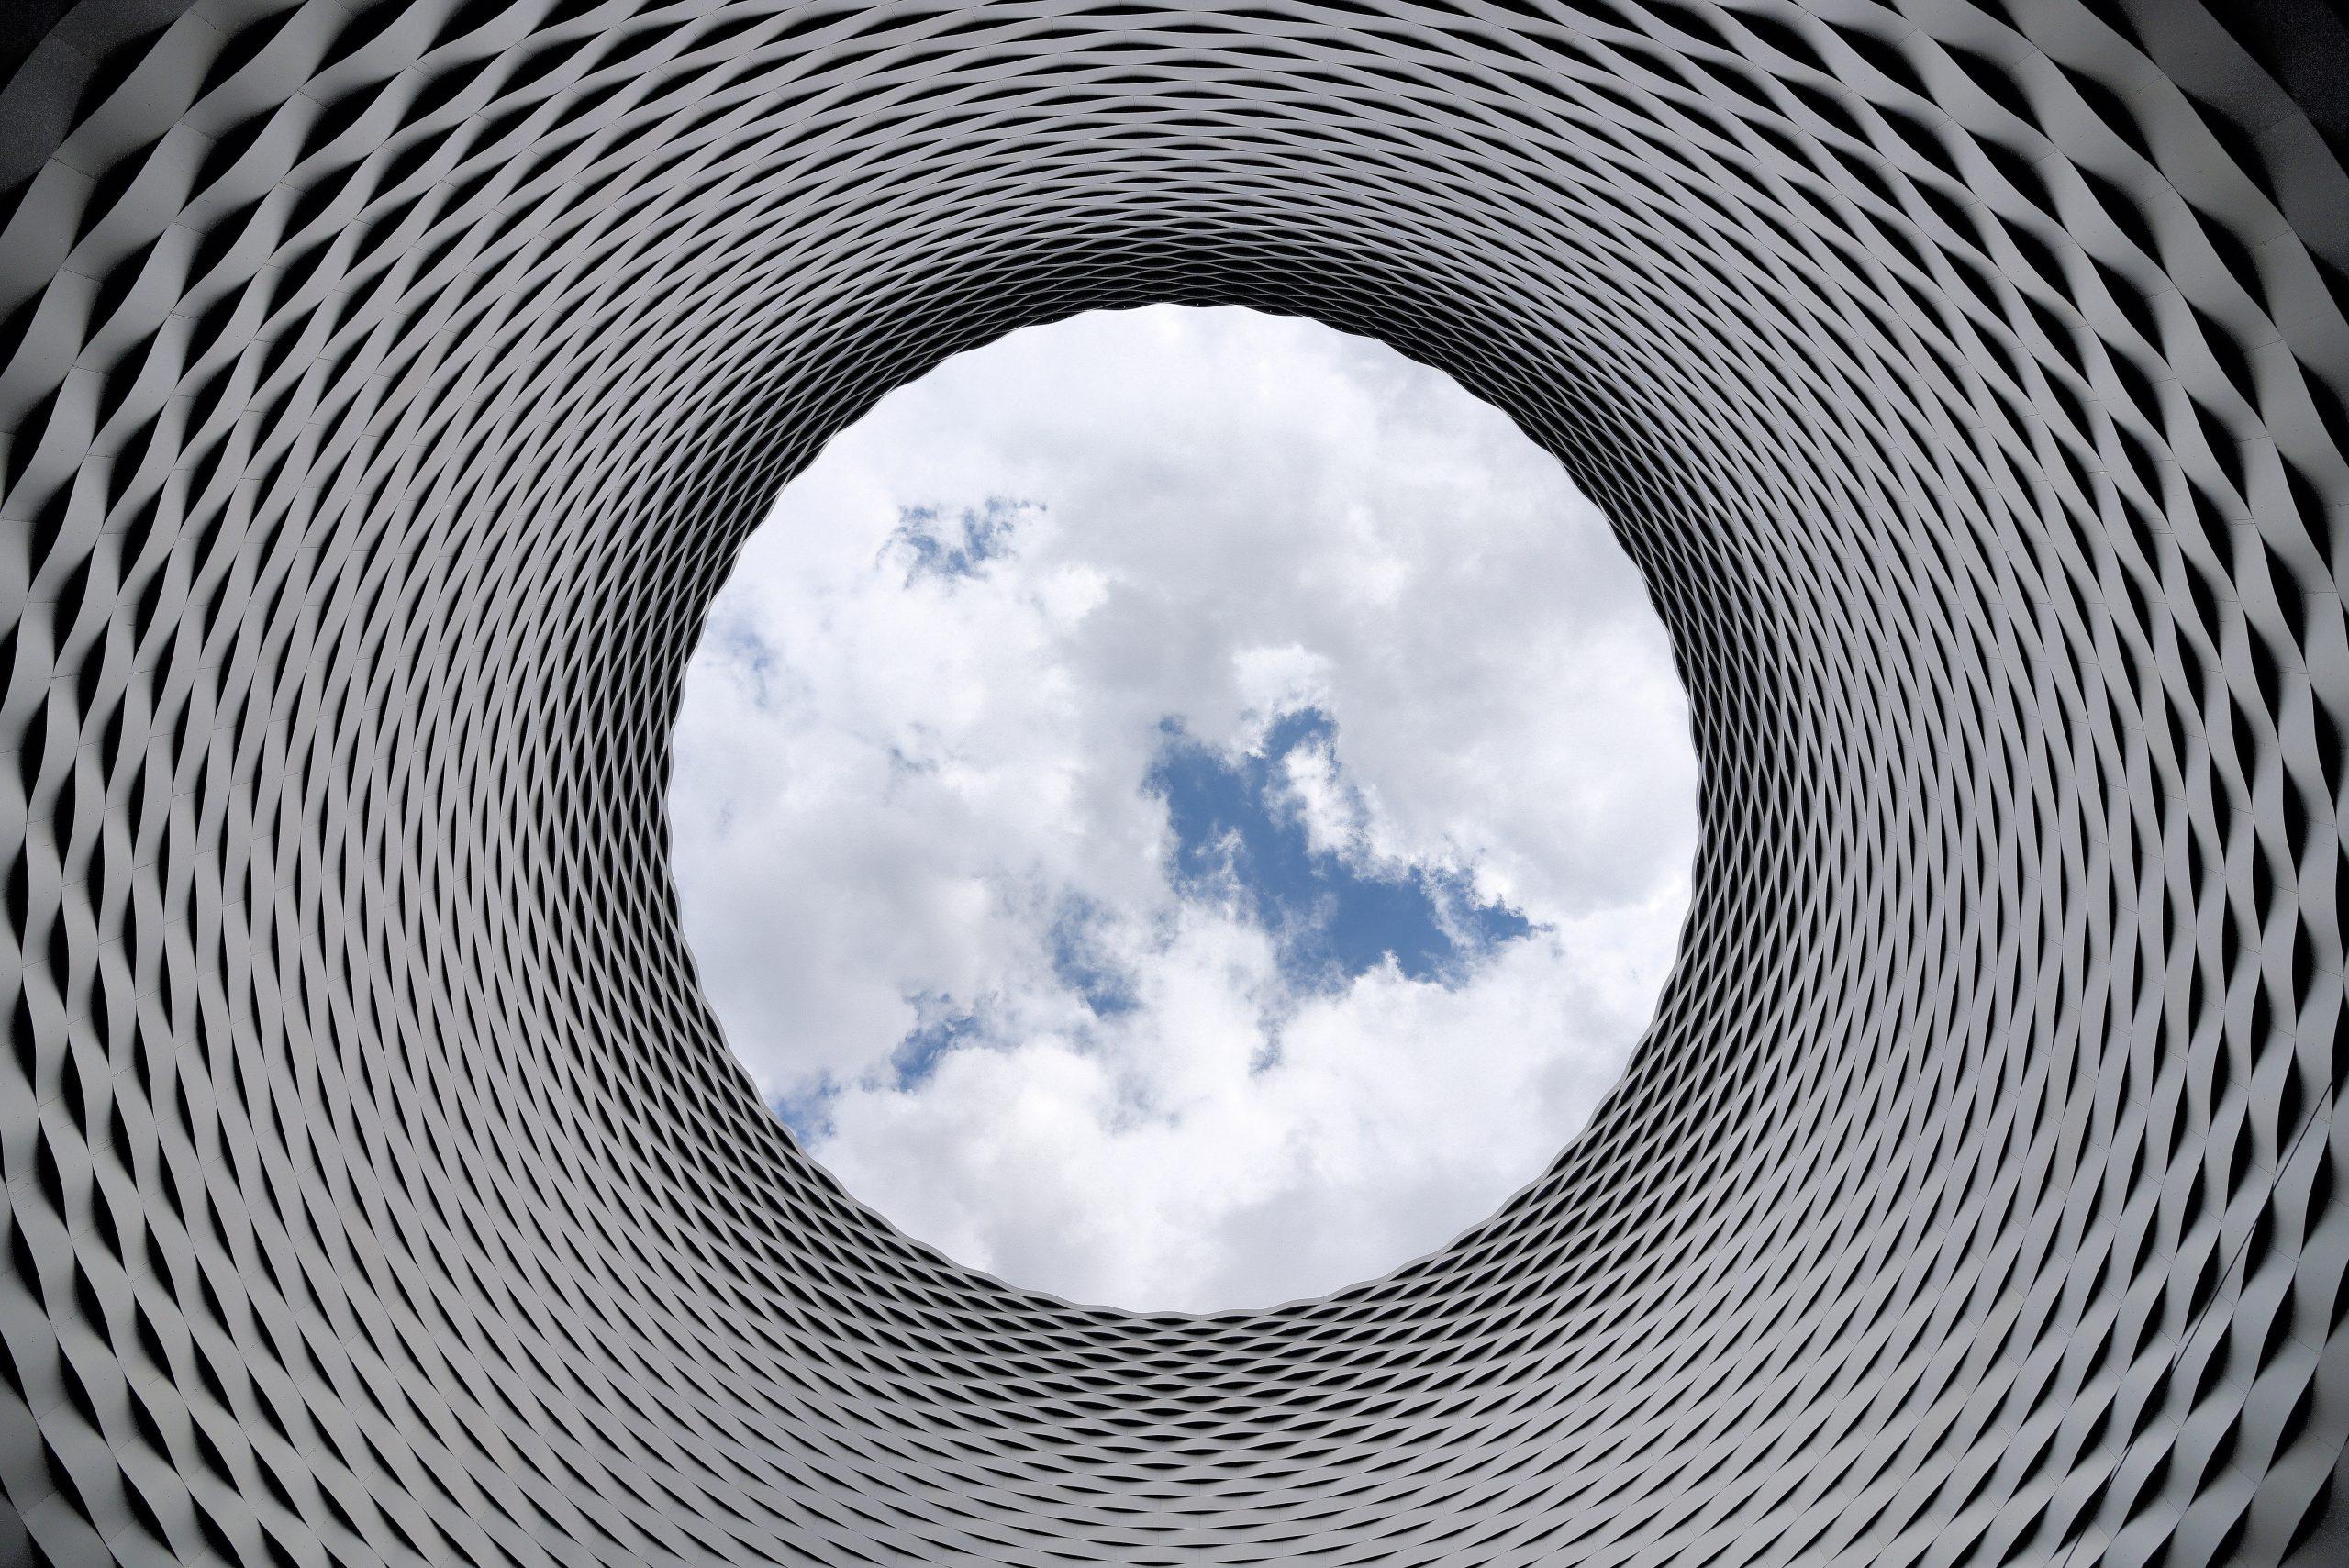 sky-scaled.jpg